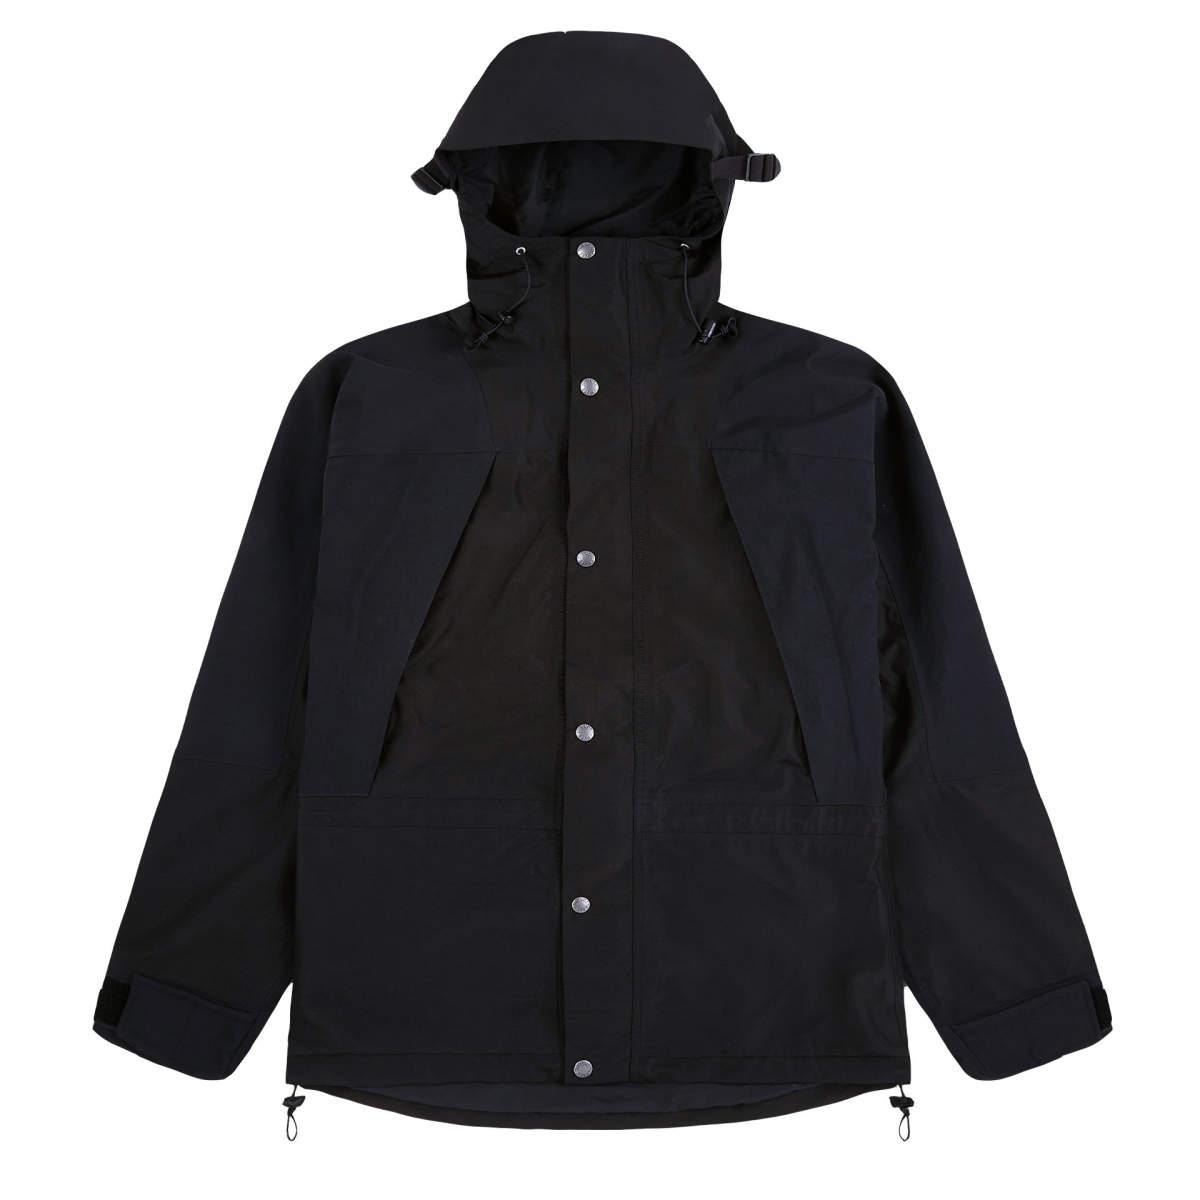 The north face 1994 retro mountain futurelight™ jacket